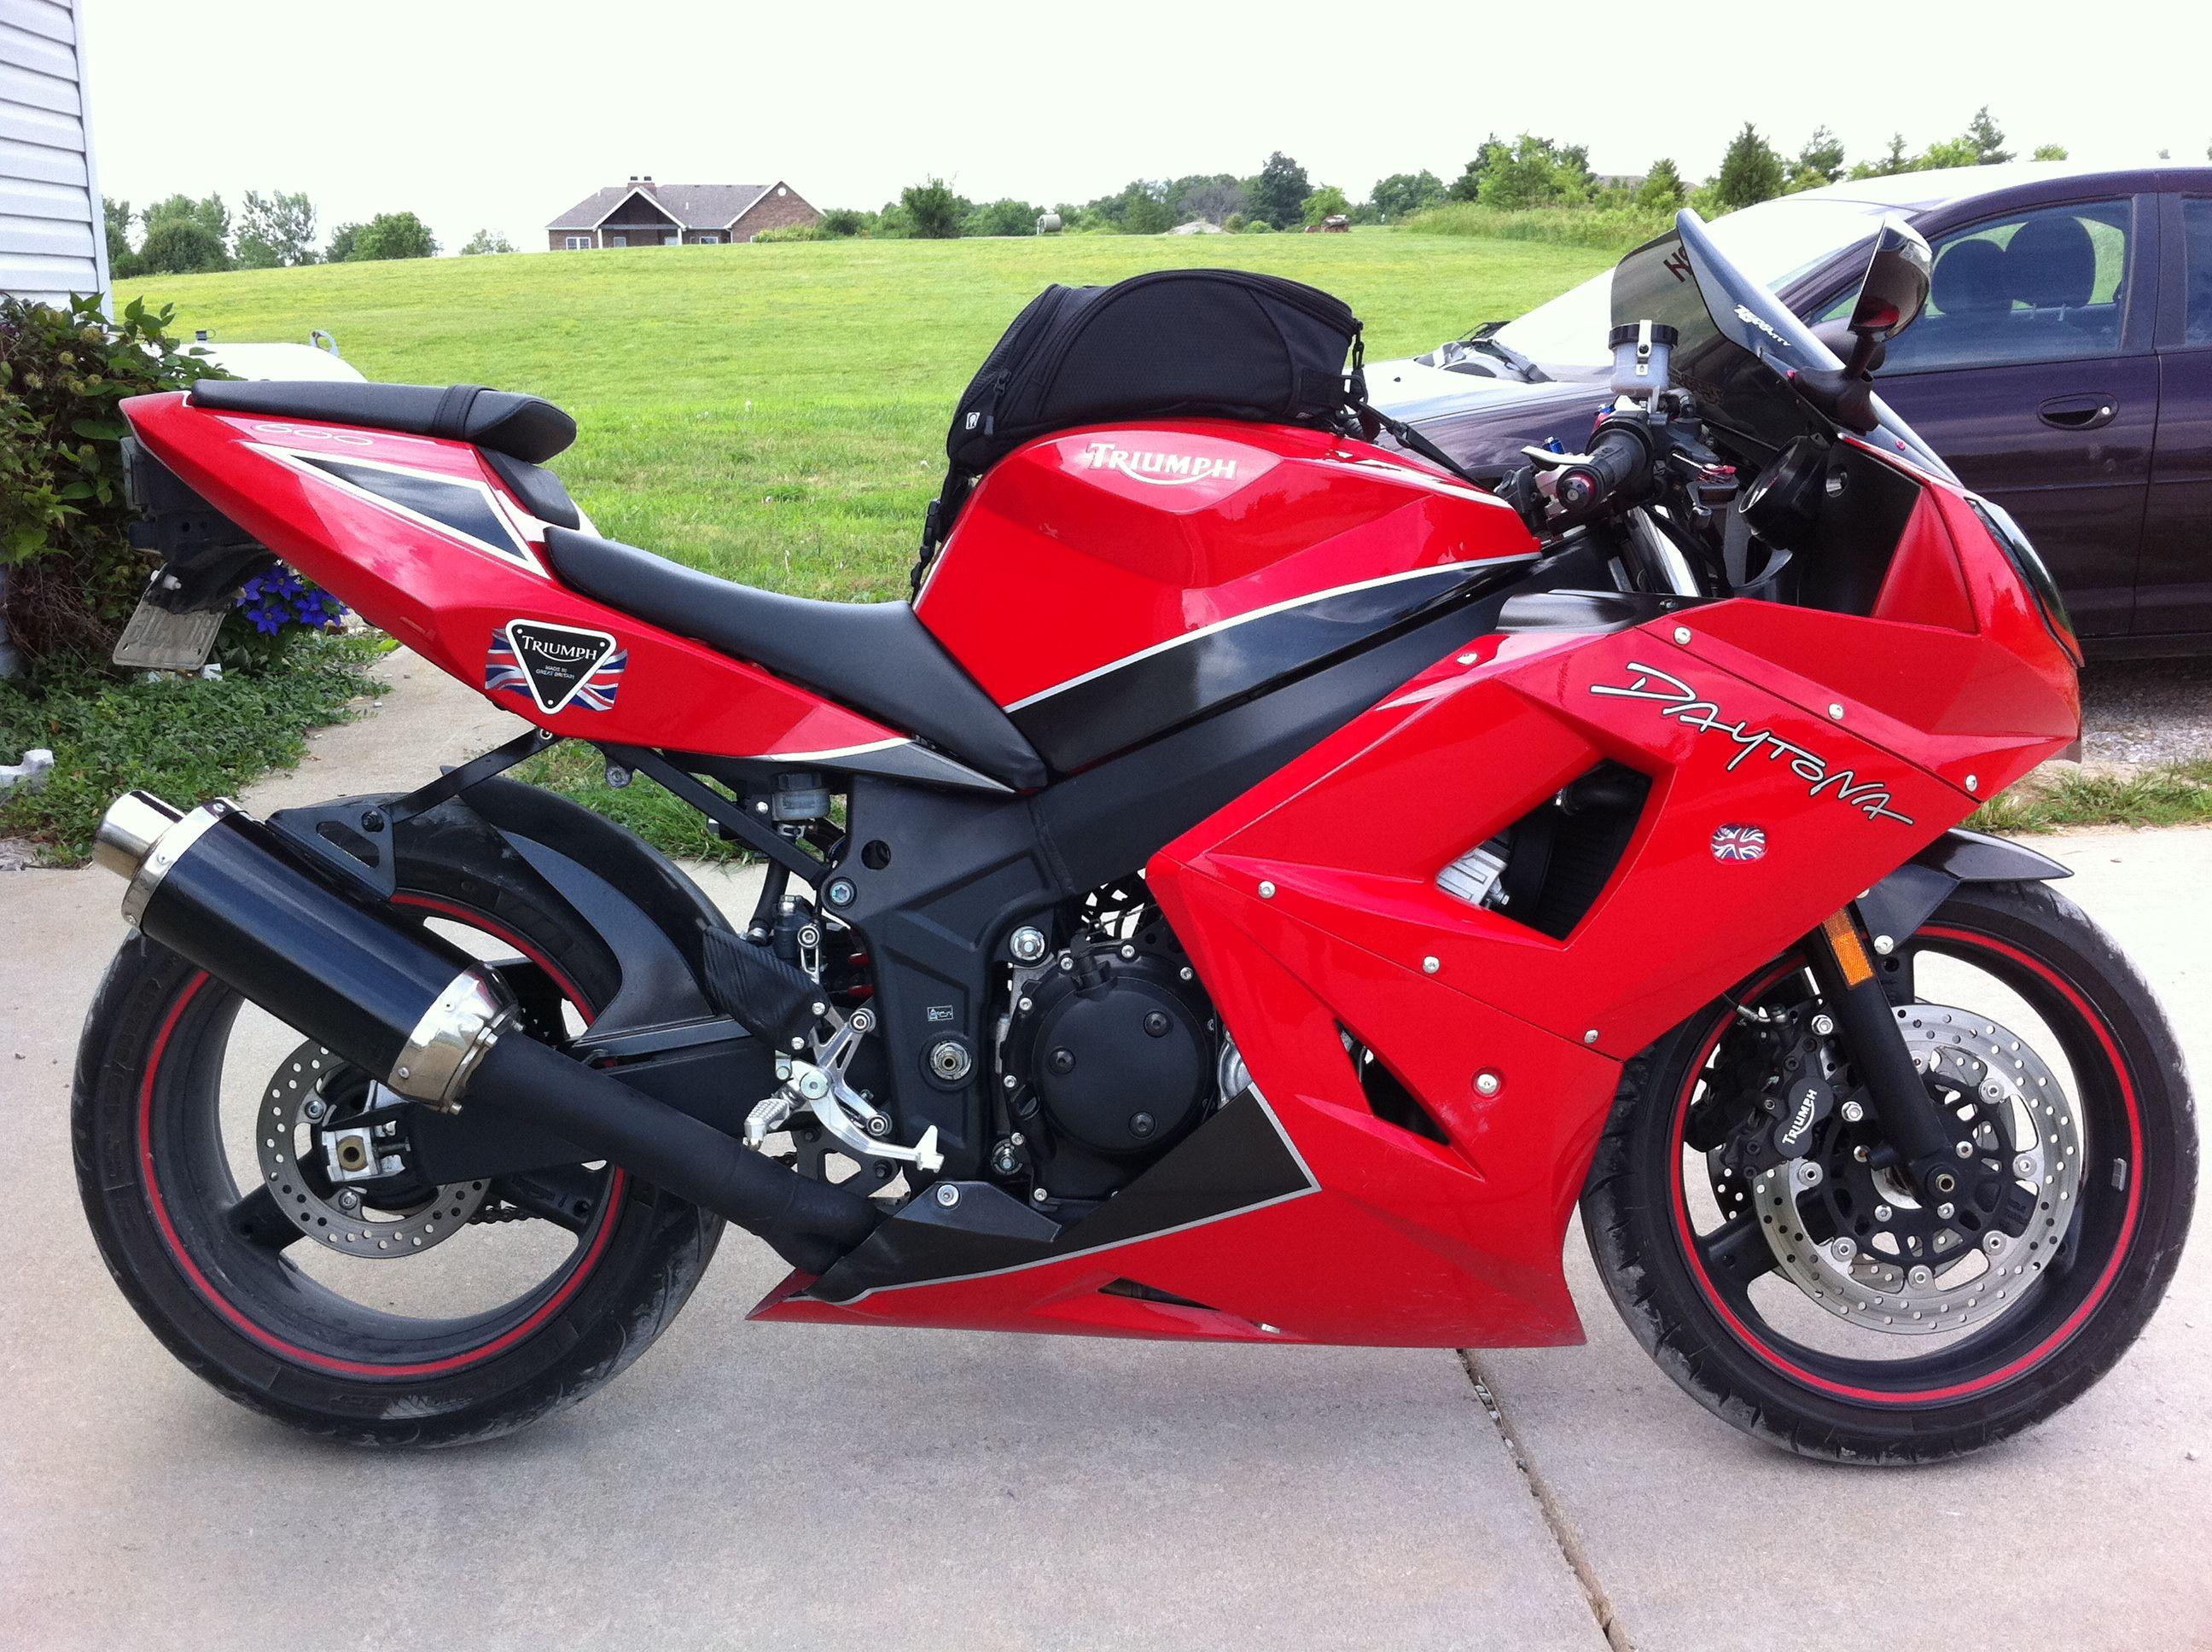 duke's custom 2004 triumph daytona 600 | motorcycle: sportbikes